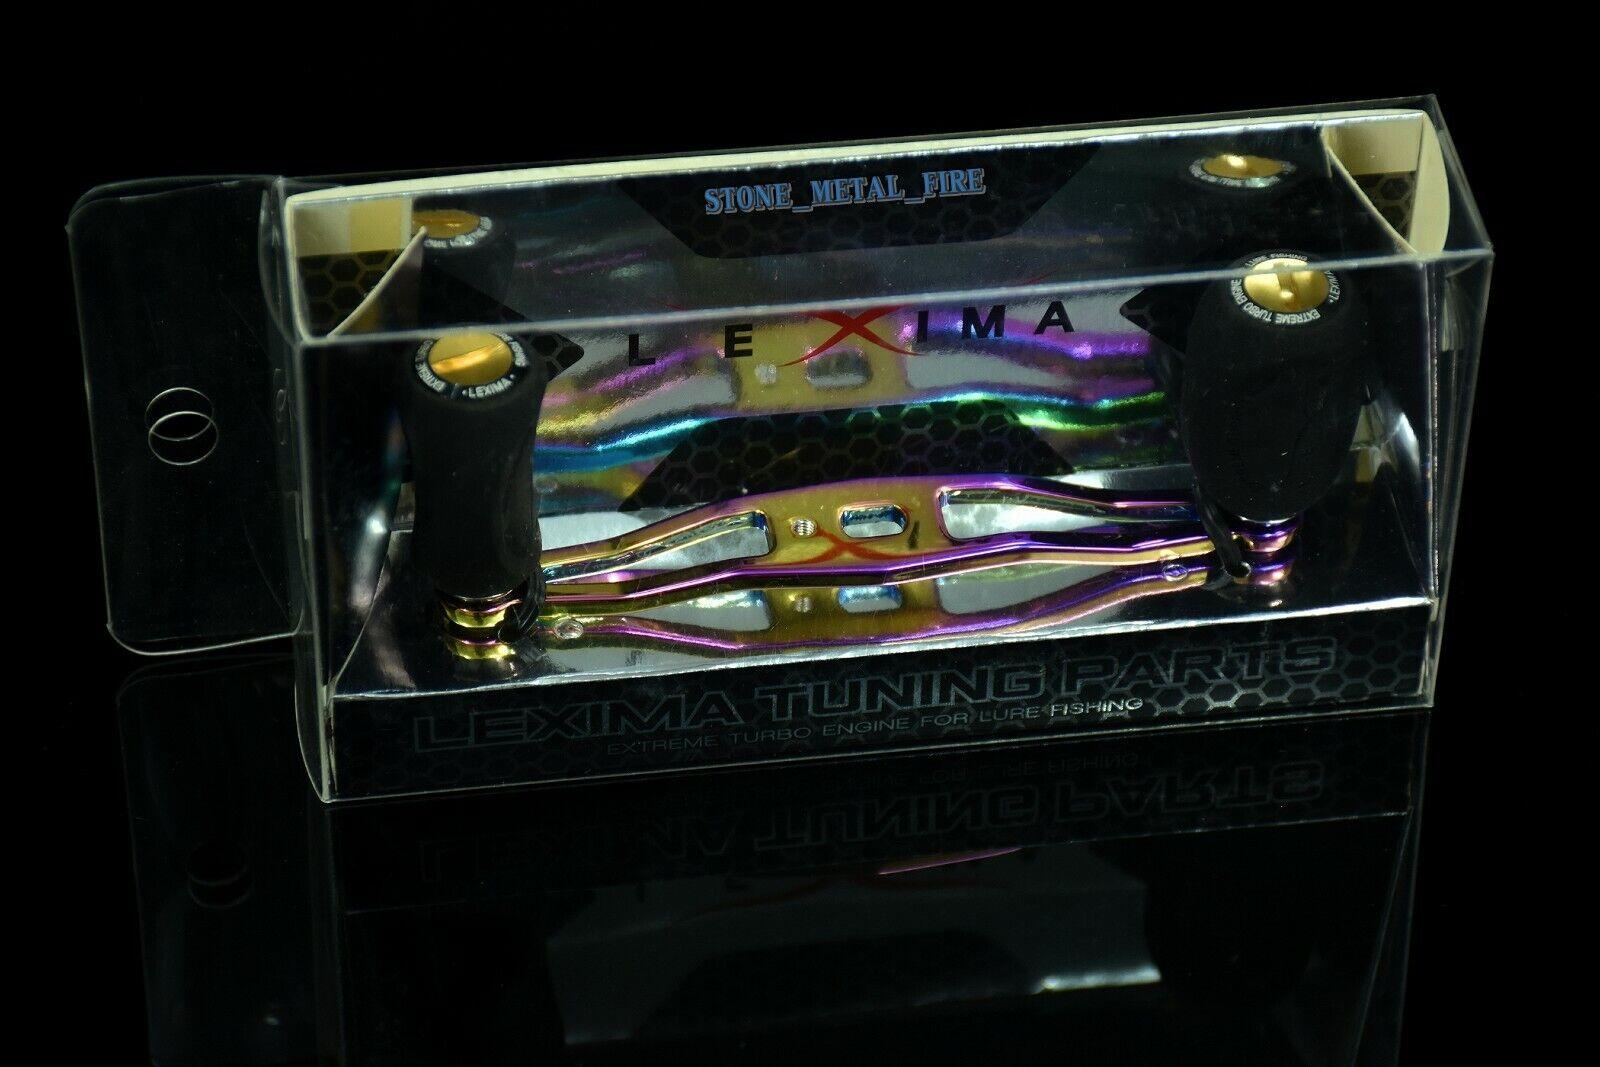 LEXIMA Duralumin Handle for Abu garcia , Daiwa  , Quantum Baitcasting Reel.  for sale online